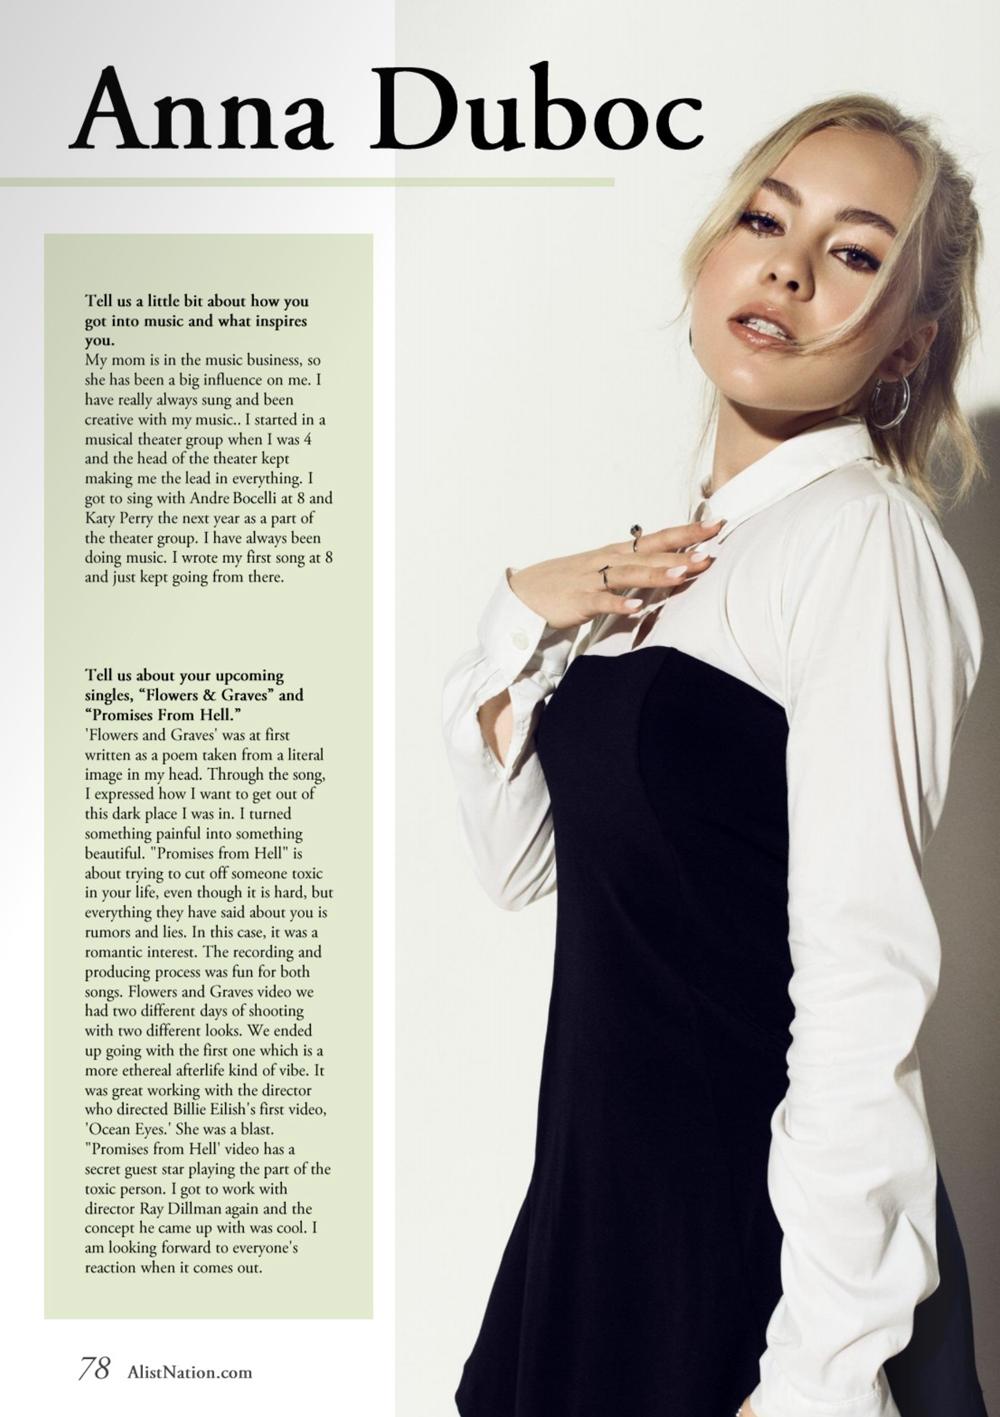 Teen A-List Nation Magazine Article